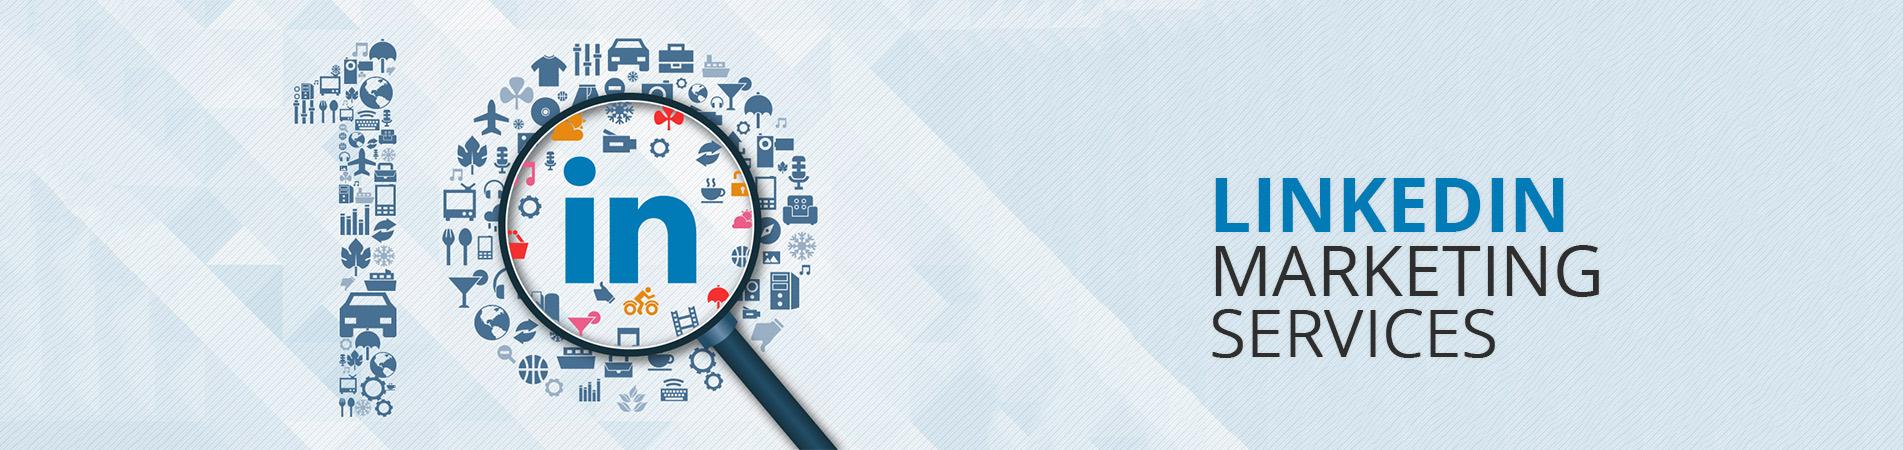 Linkedin Marketing Service in Bangalore India